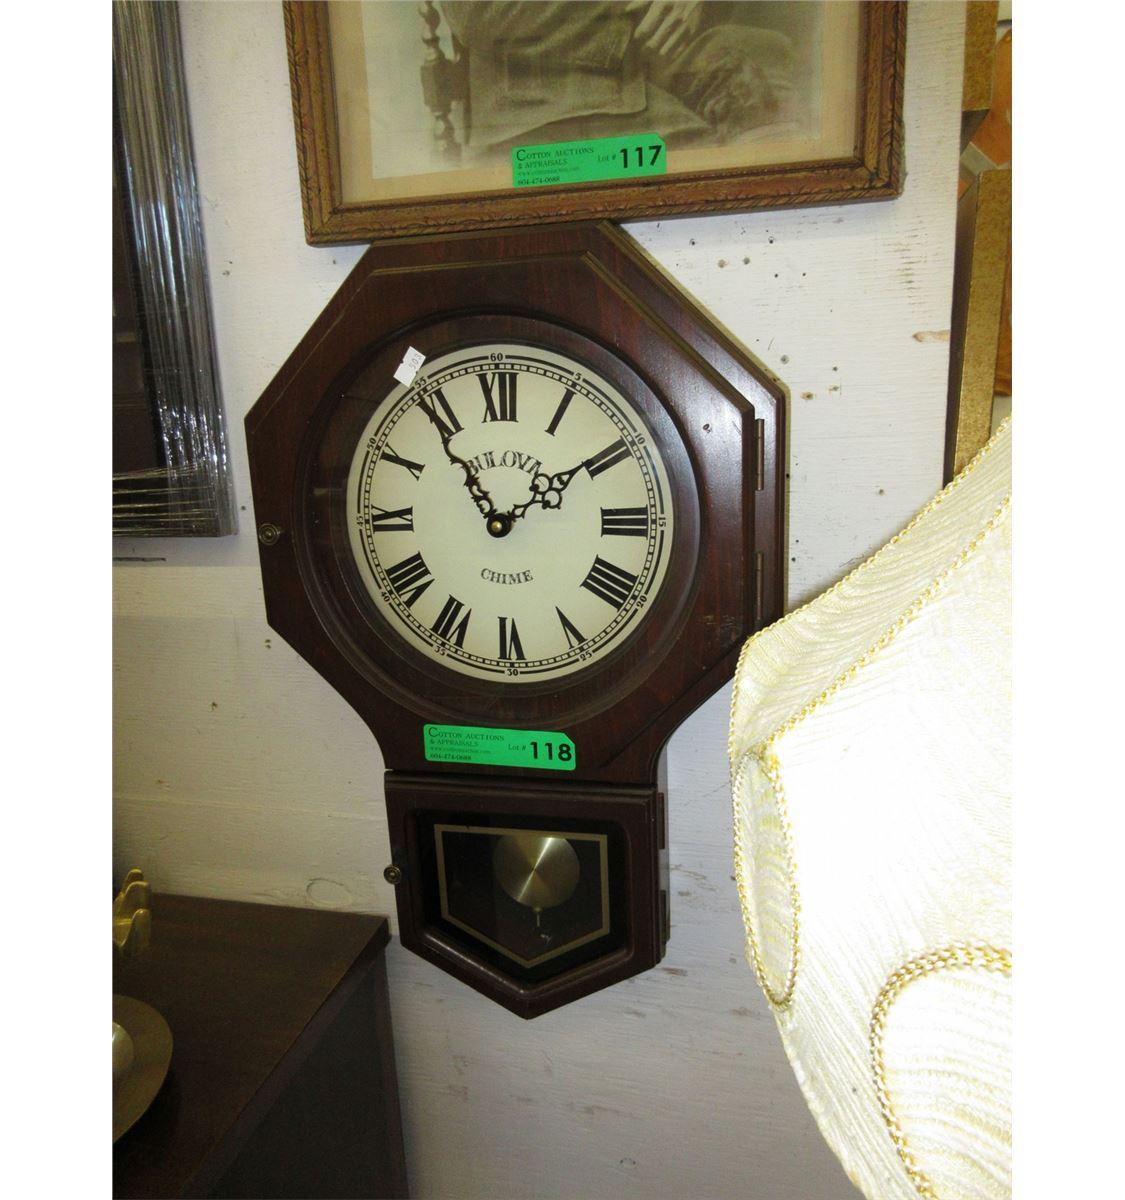 Used Bulova chime wall clock